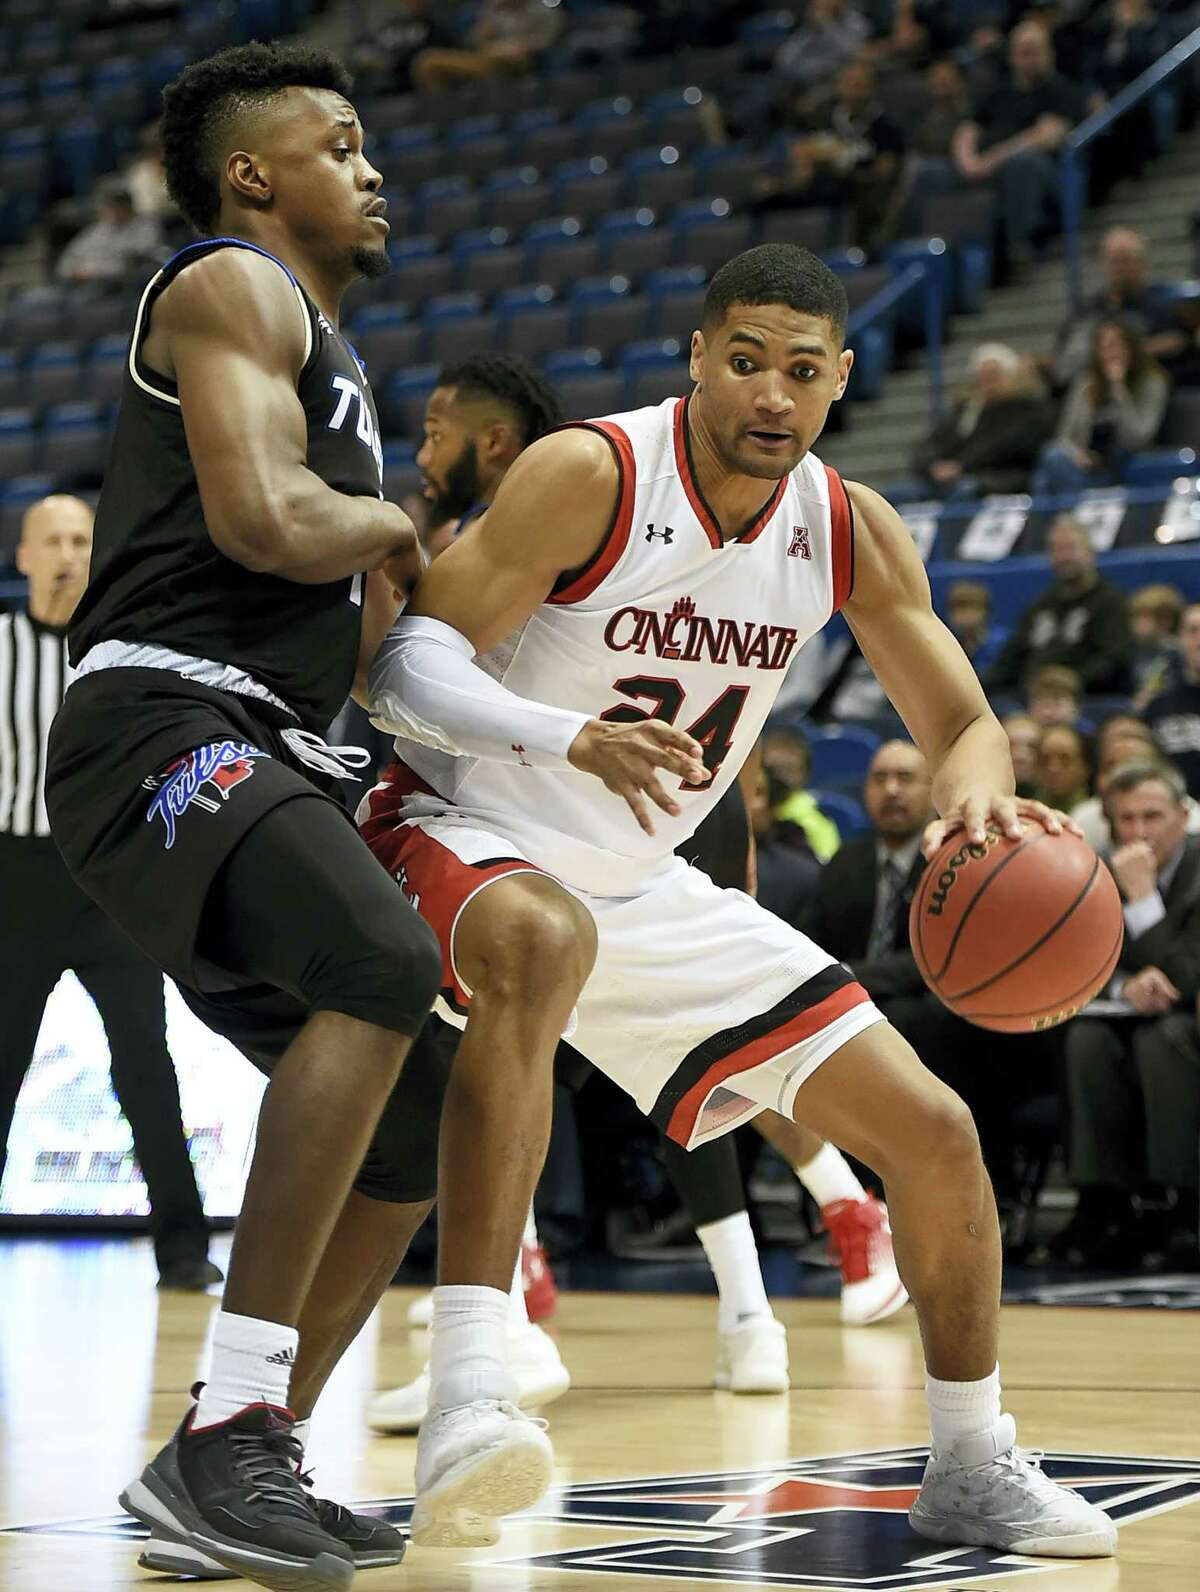 Cincinnati's Kyle Washington dribbles around Tulsa's Martins Igbanu.